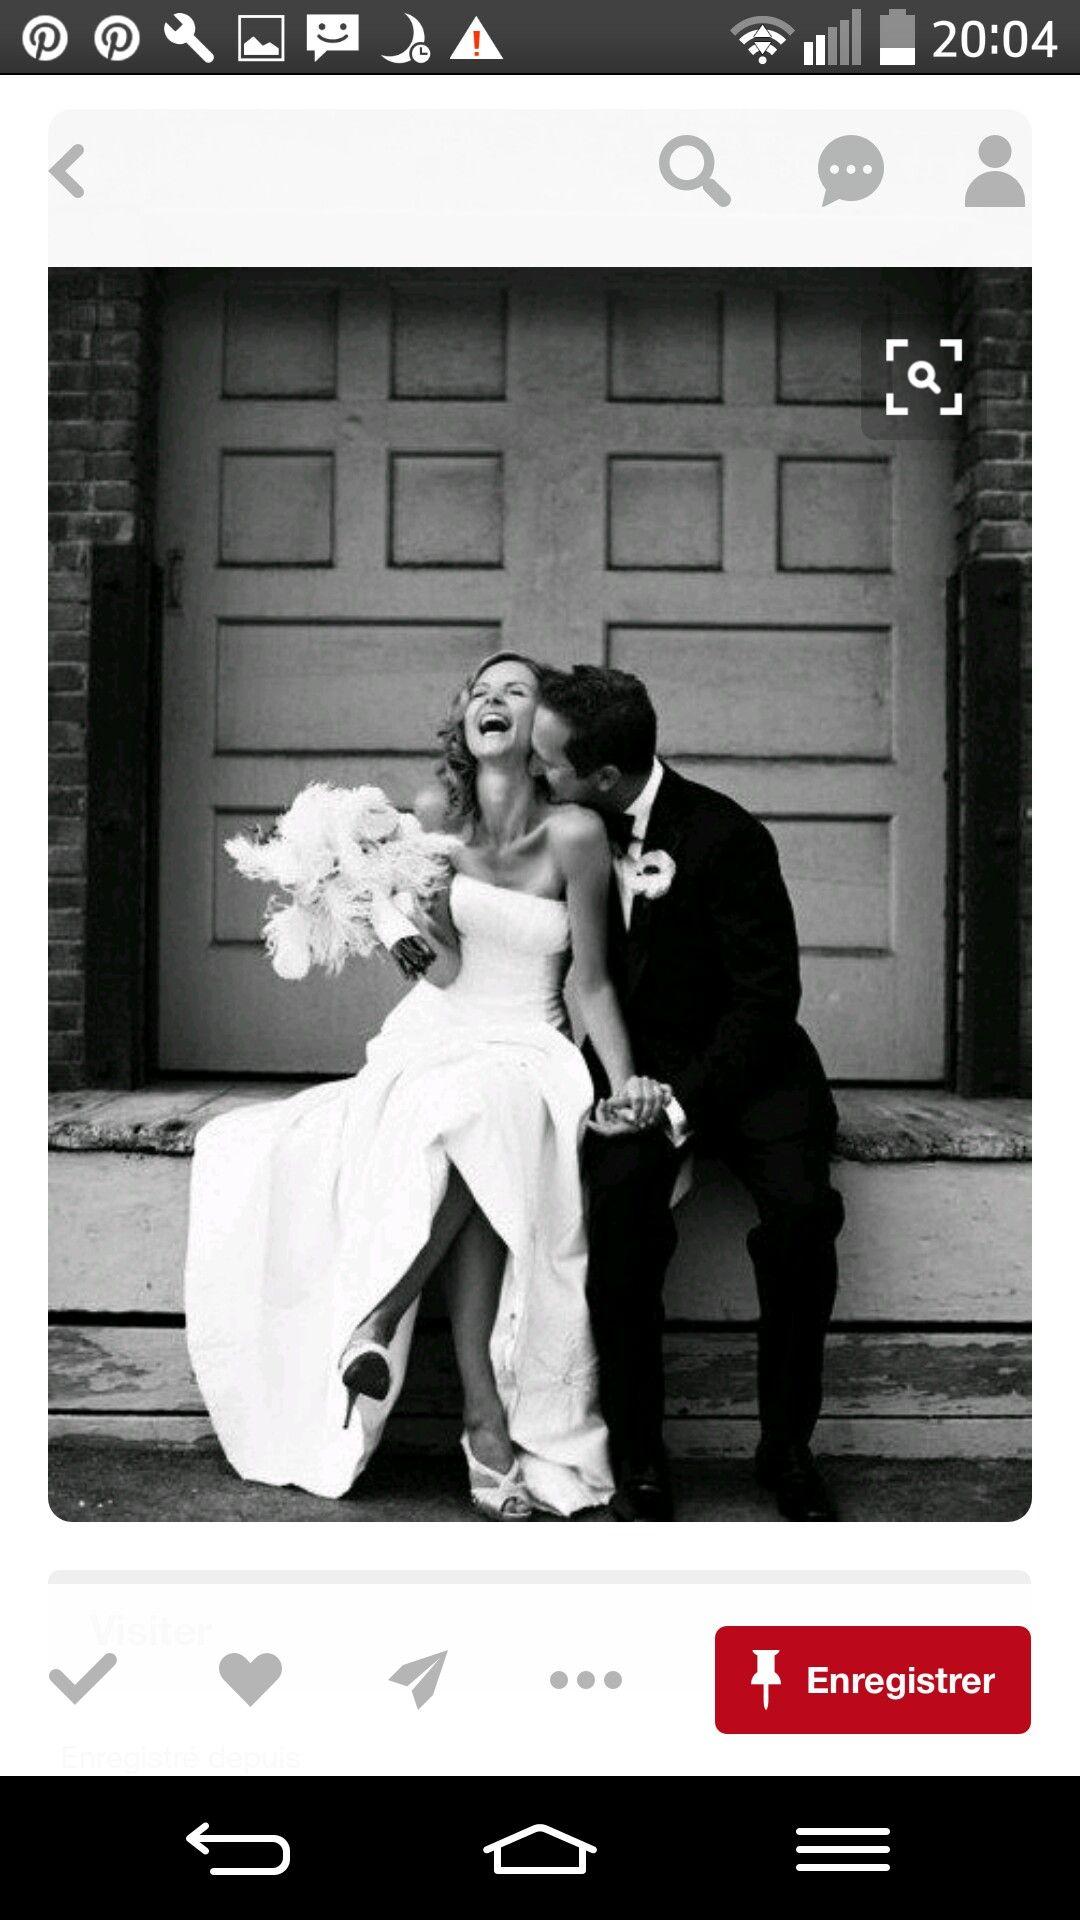 Wear your wedding dress on your anniversary  Pin by Sharon Flippo on Wedding photos  Pinterest  Weddings